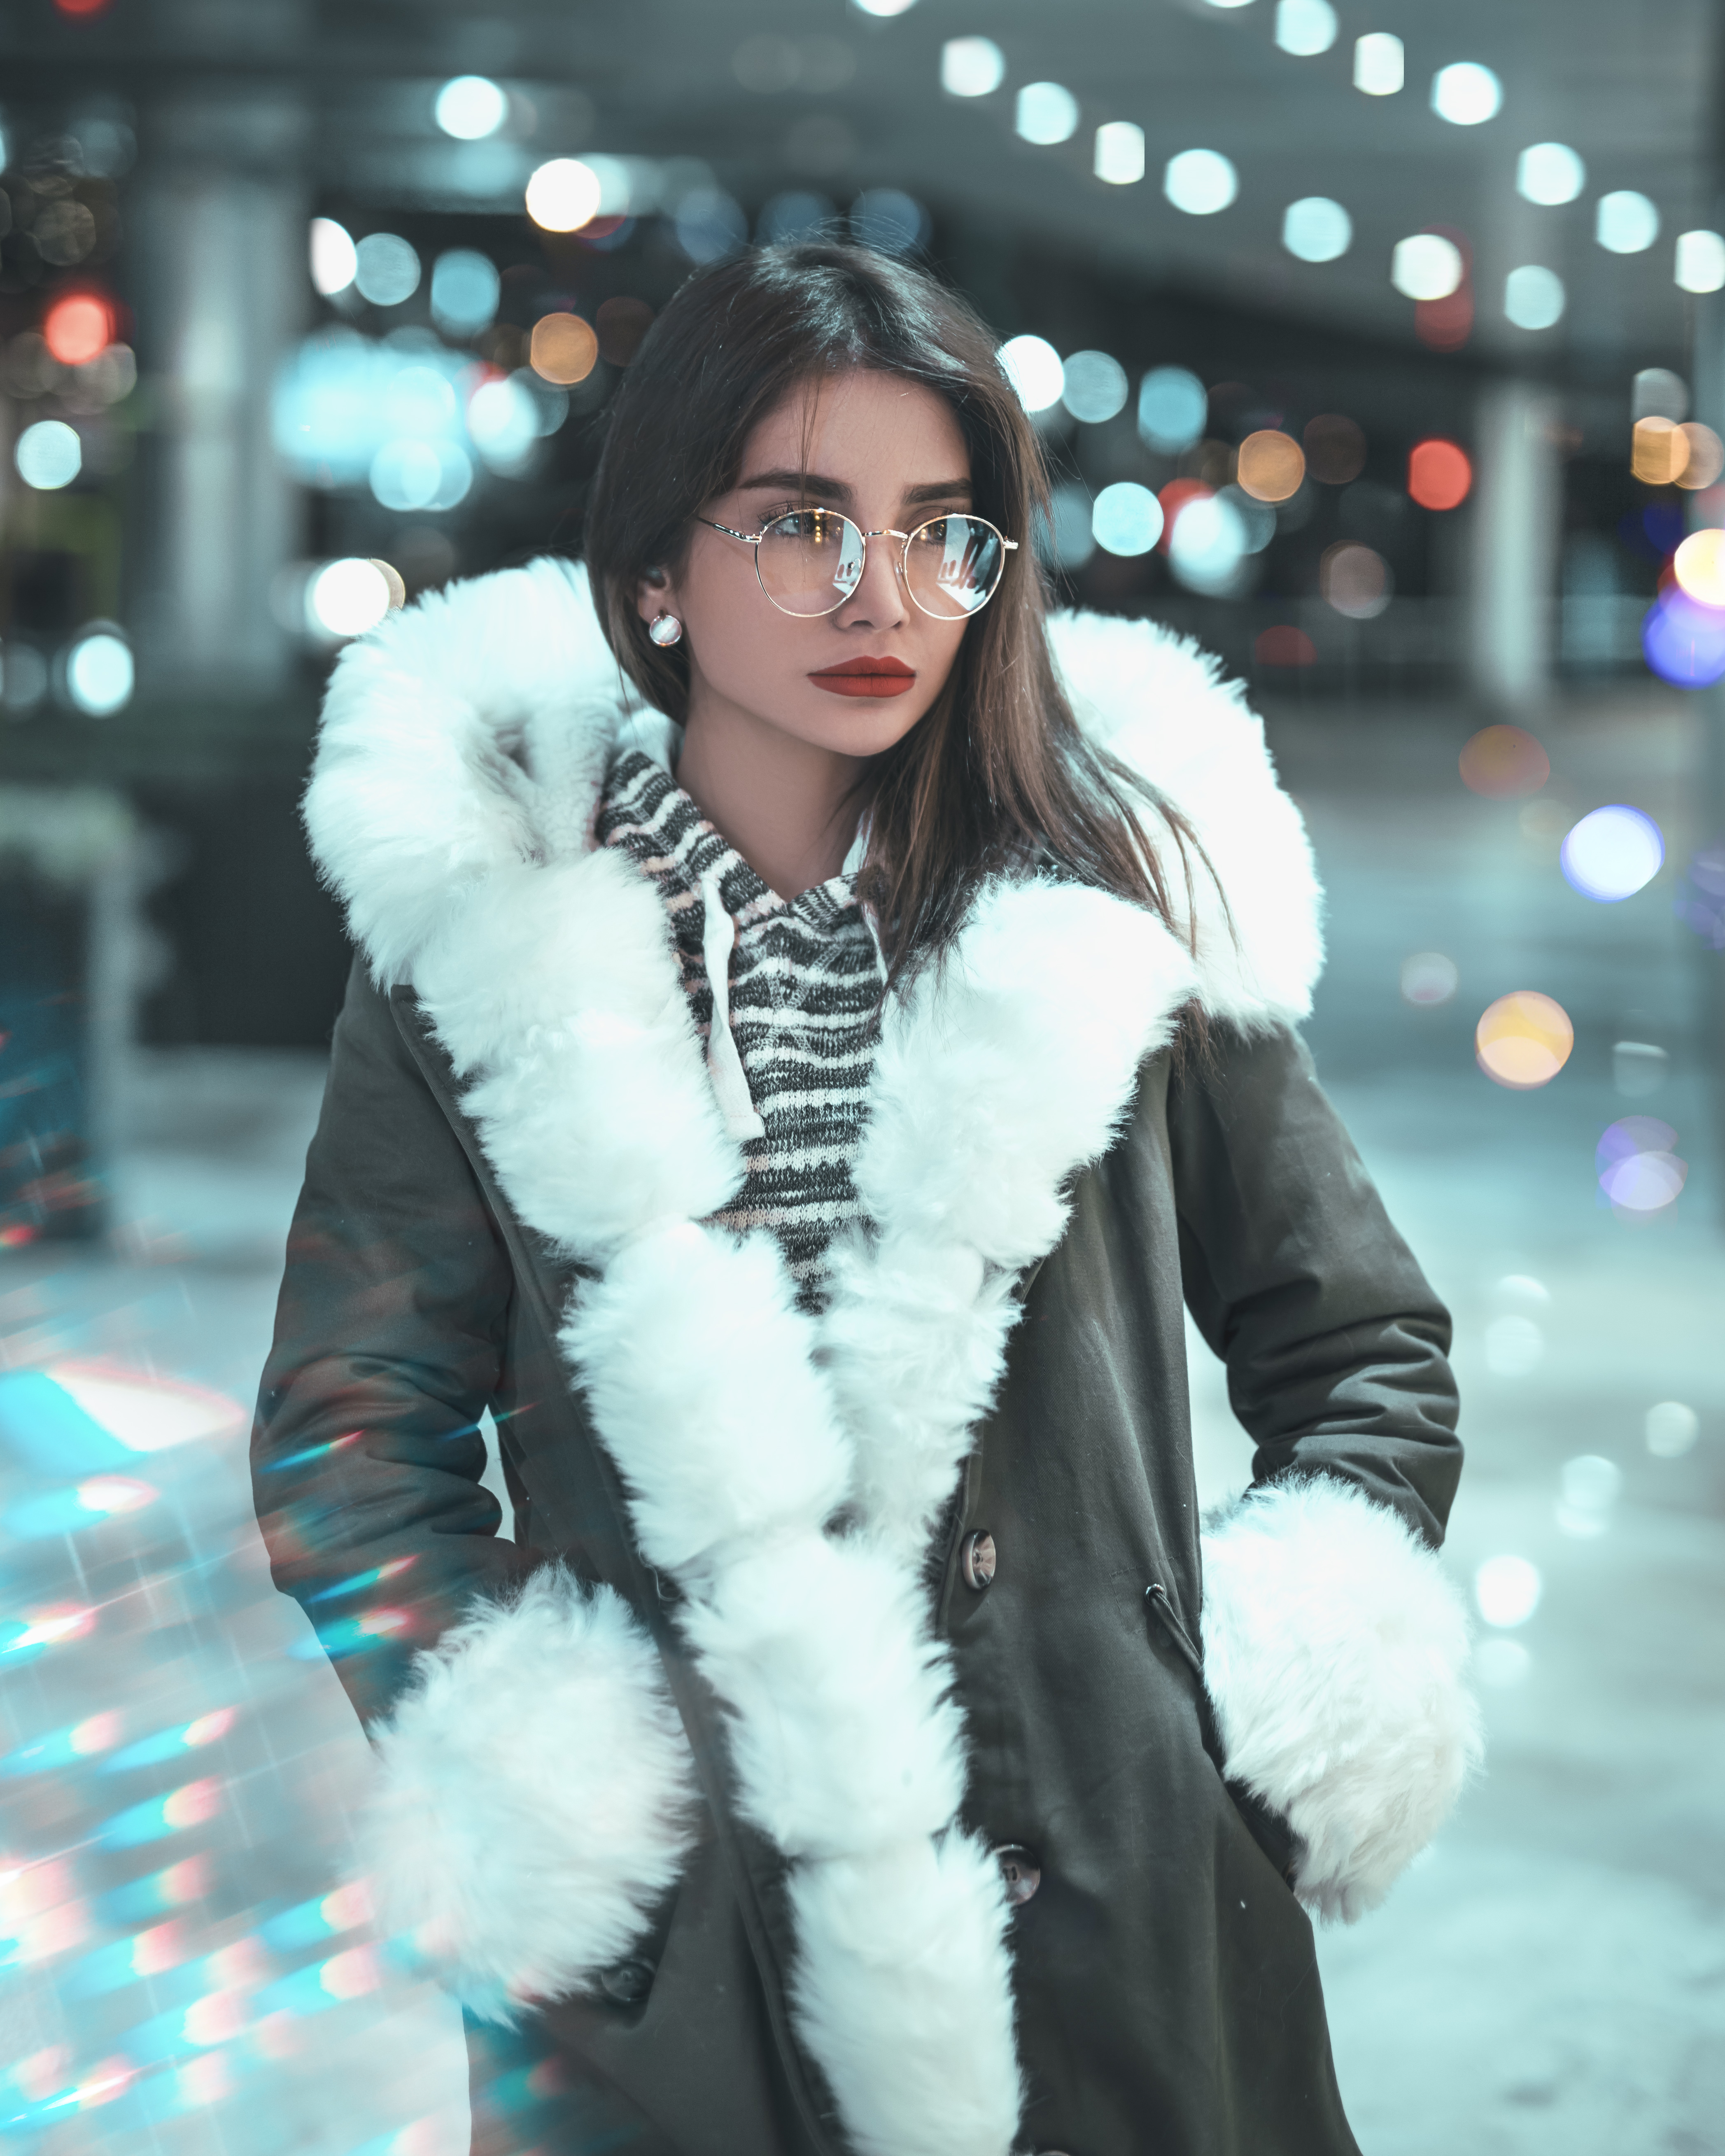 Photo of Woman Wearing Fur Coat